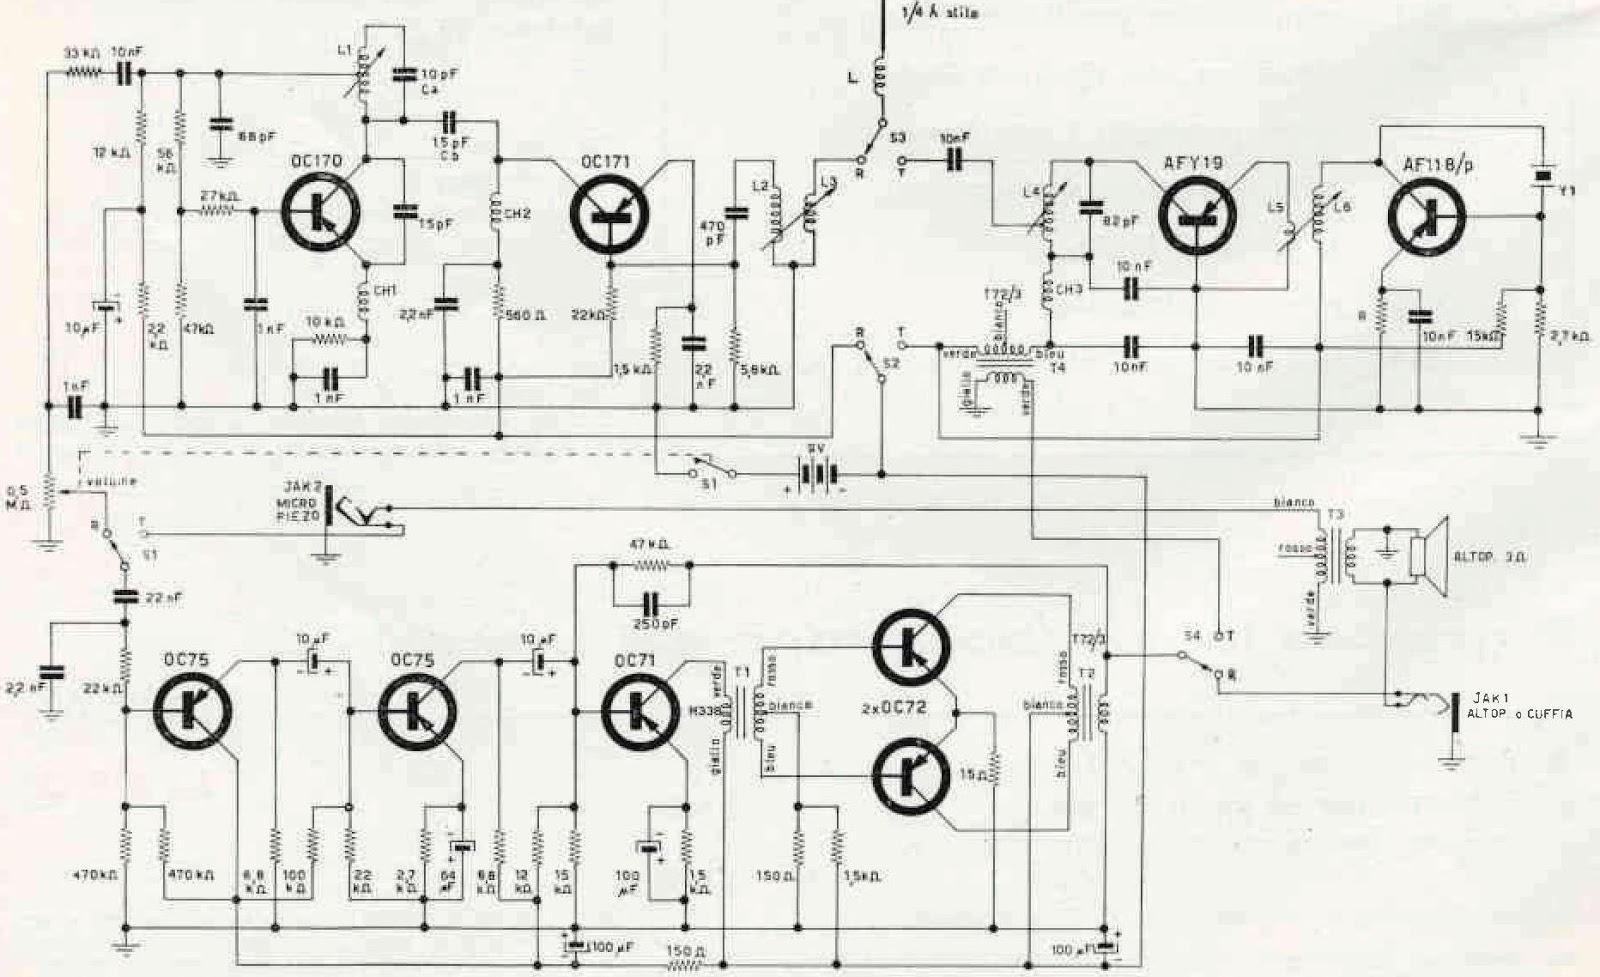 esquemas projetos eletr u00f4nicos   walkie talkie 27 ou 28 mhz